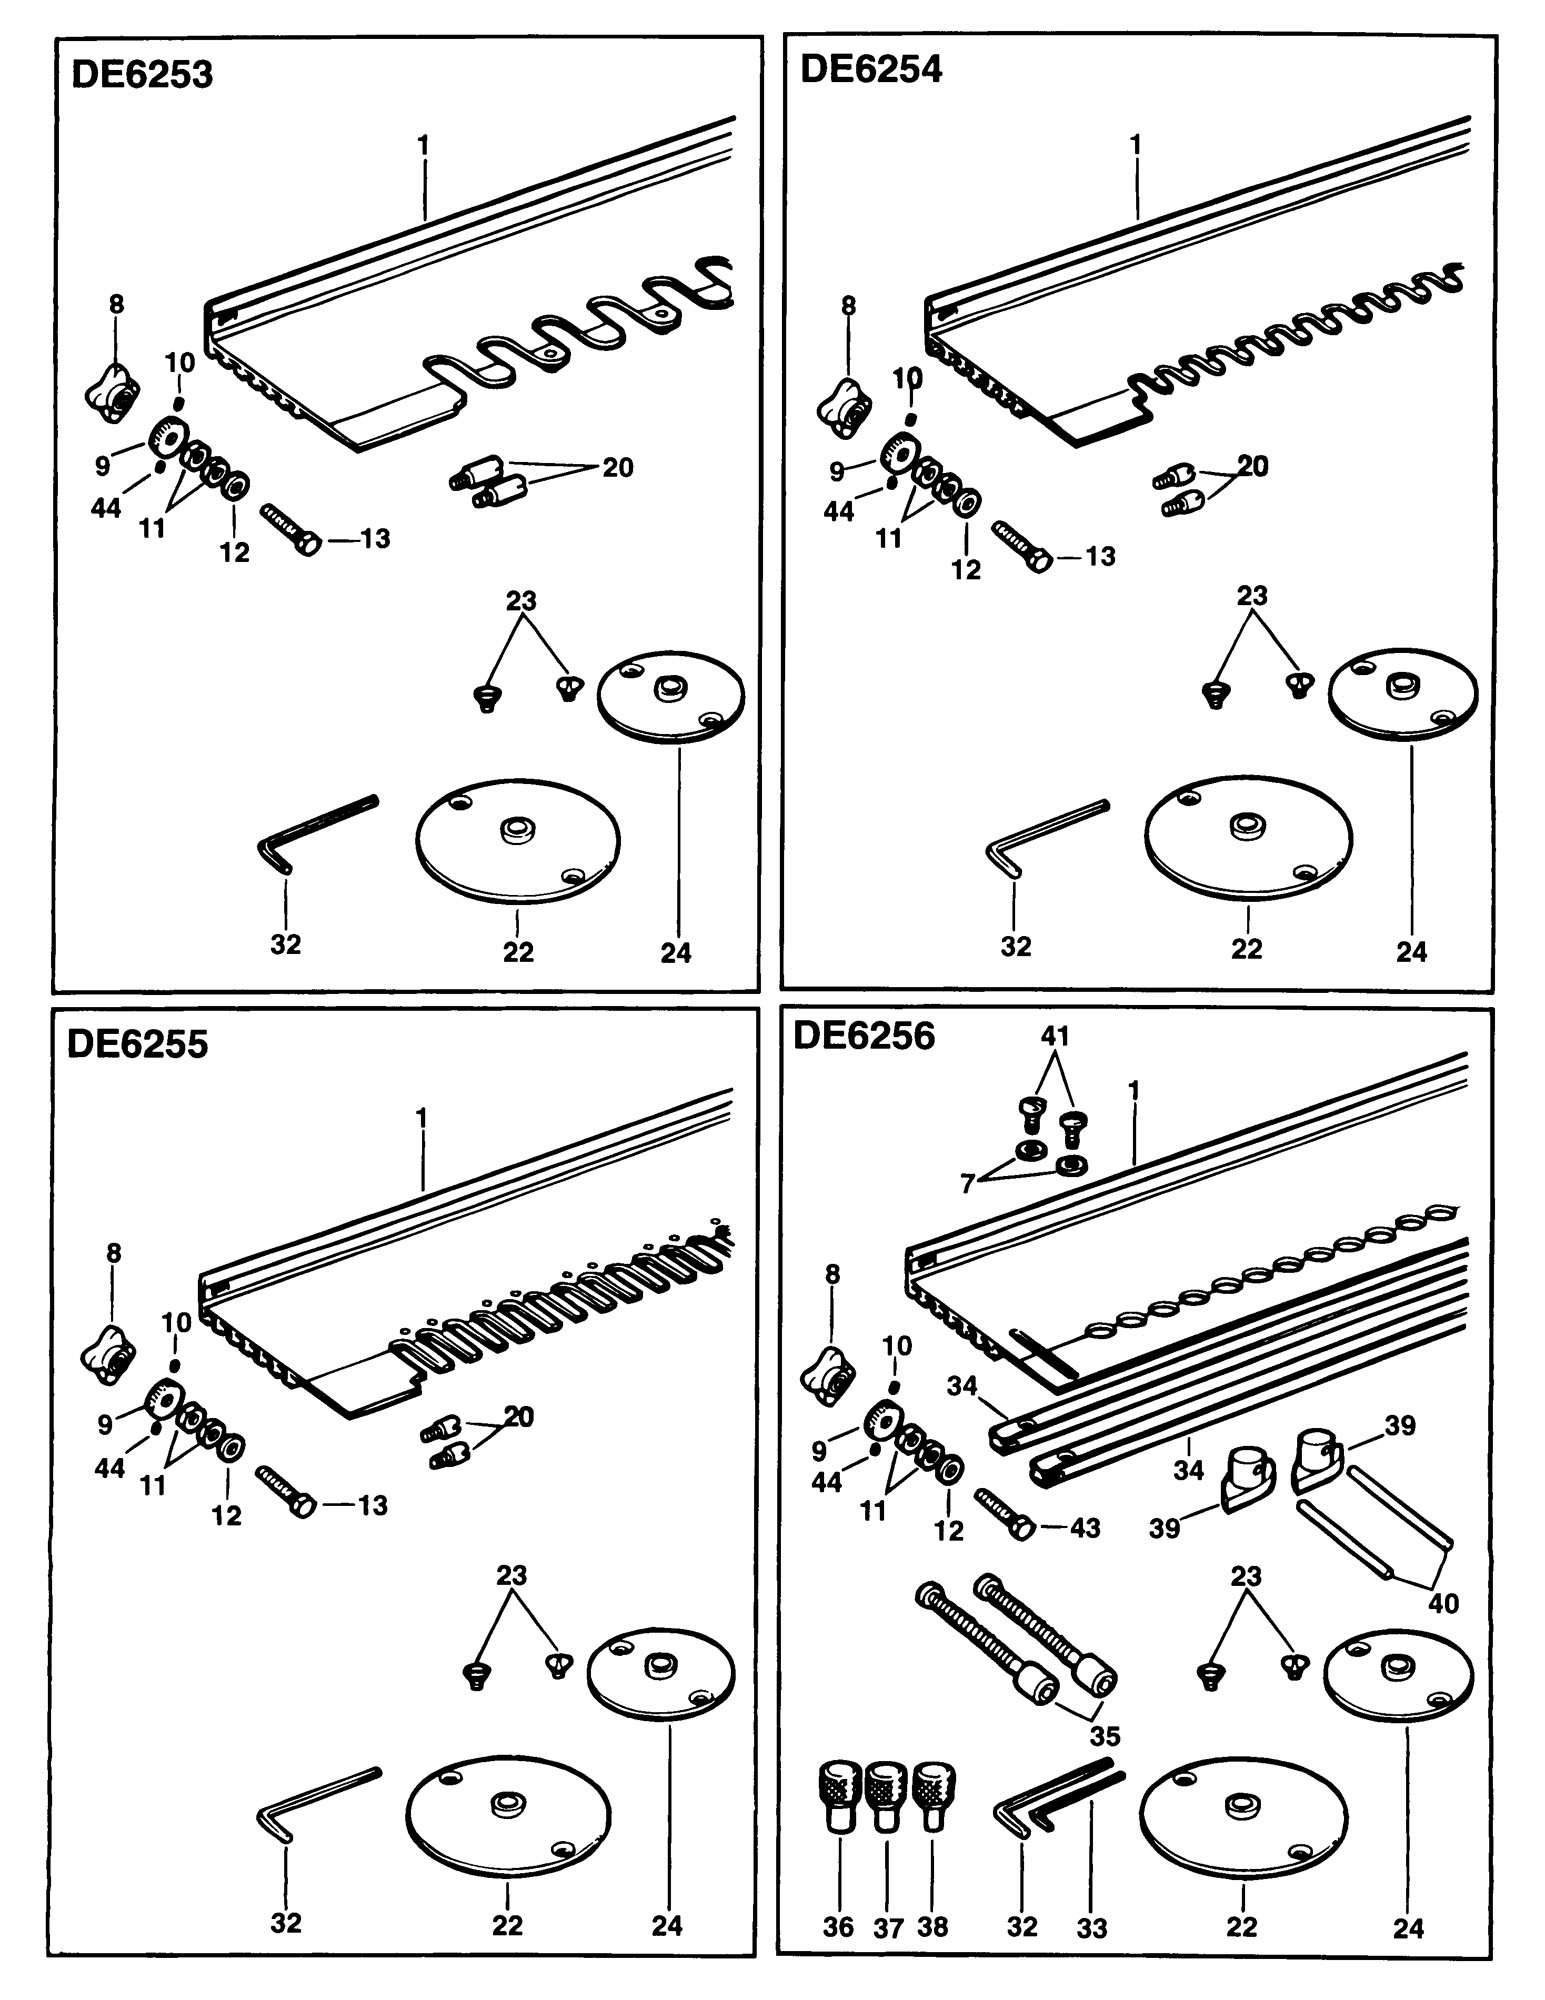 Spares for Dewalt De6256 Dovetail Jig (type 1) SPARE